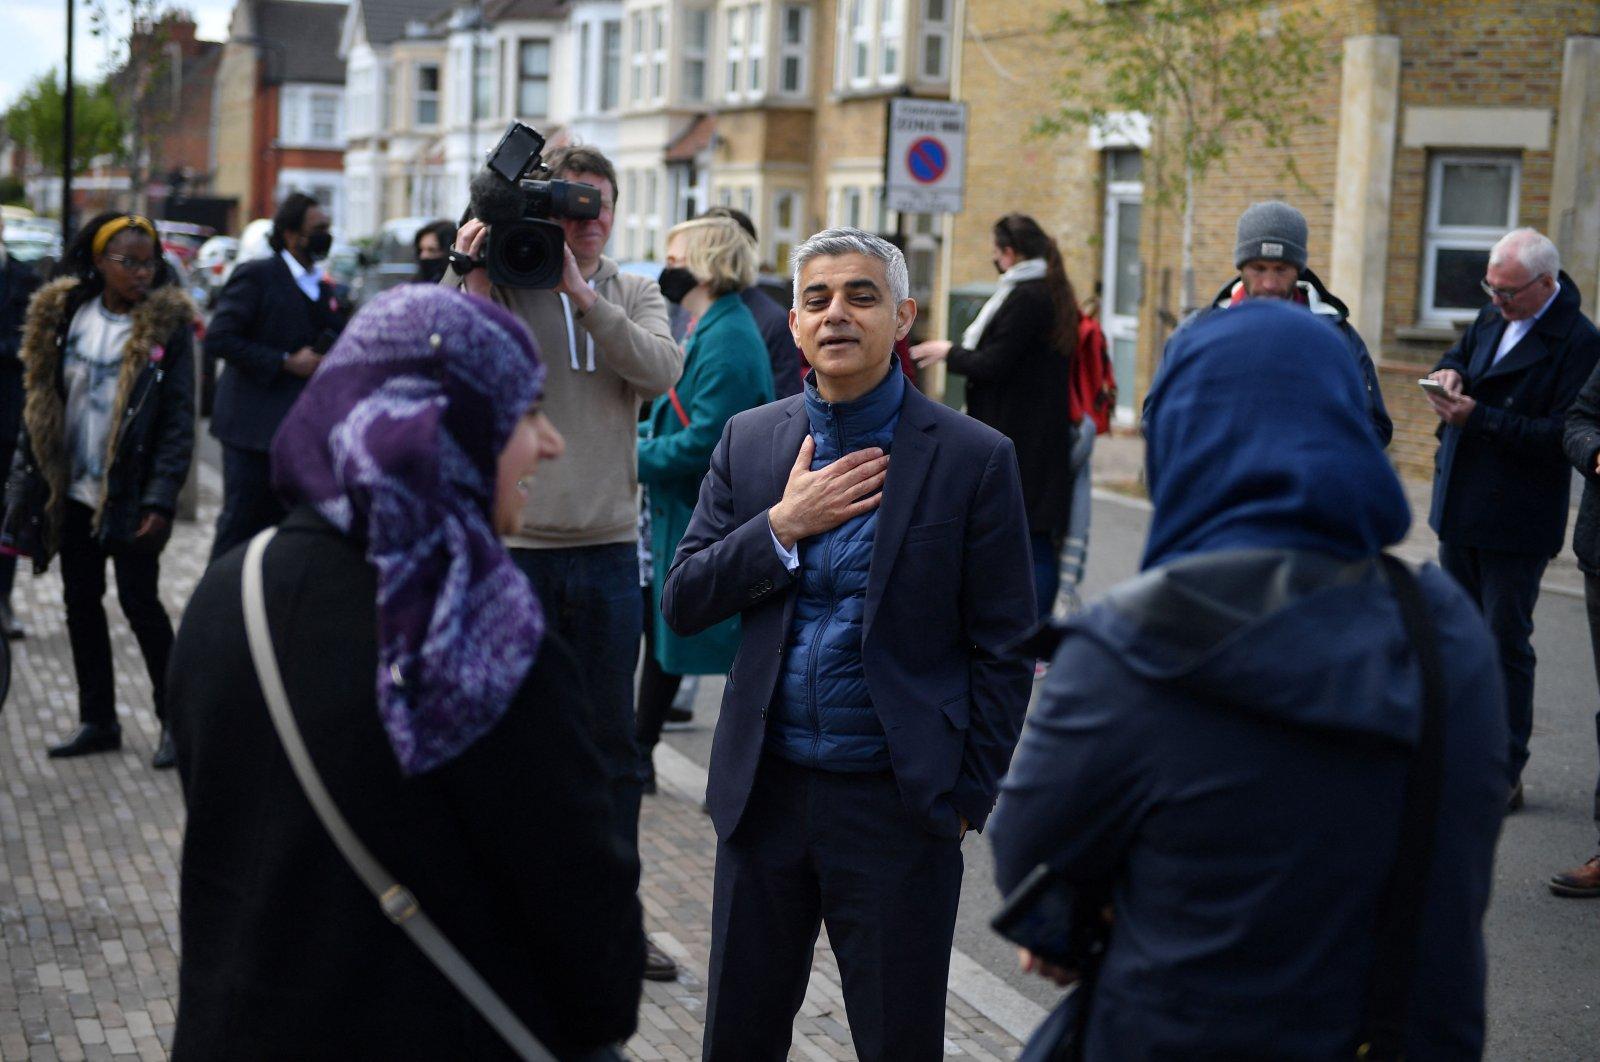 London picks Sadiq Khan: Impacts on Turkish community | Opinion